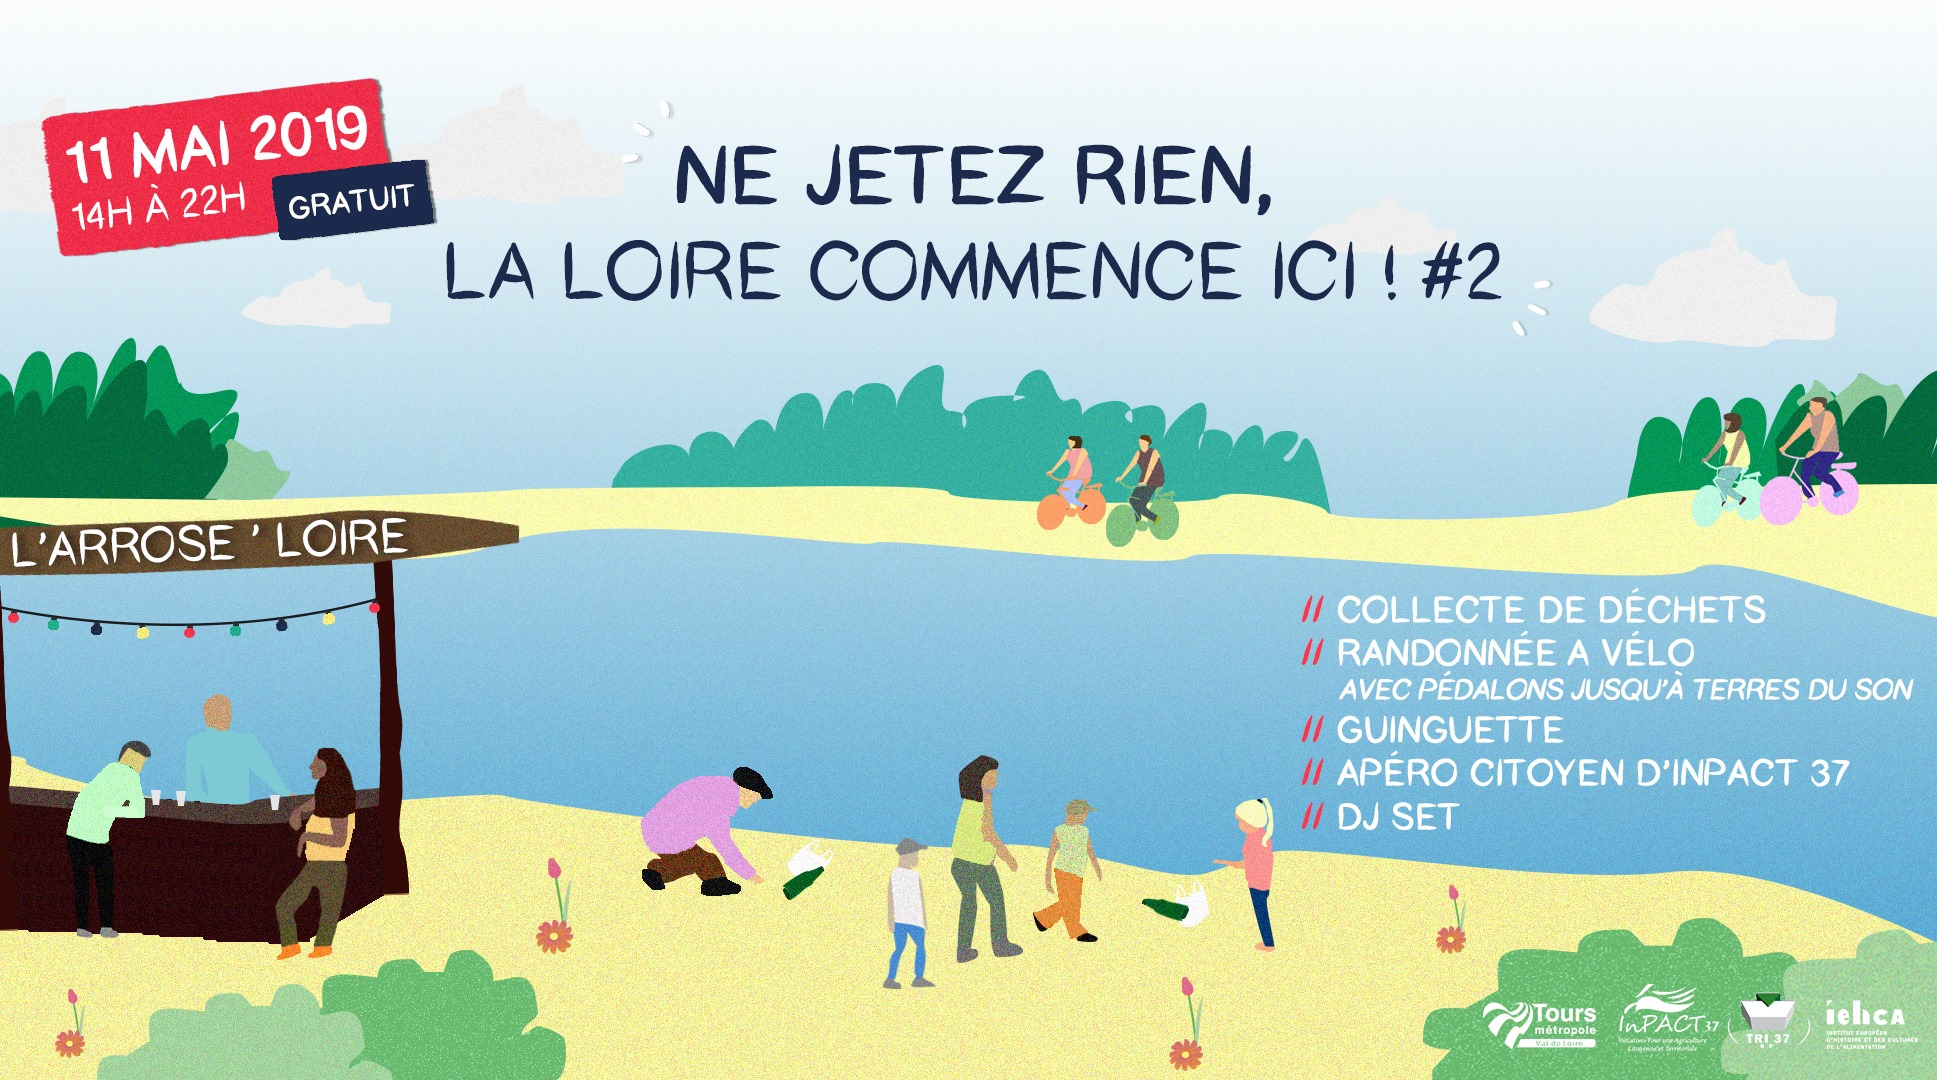 """Ne jetez rien la Loire commence ici !"" 11 mai 2019"